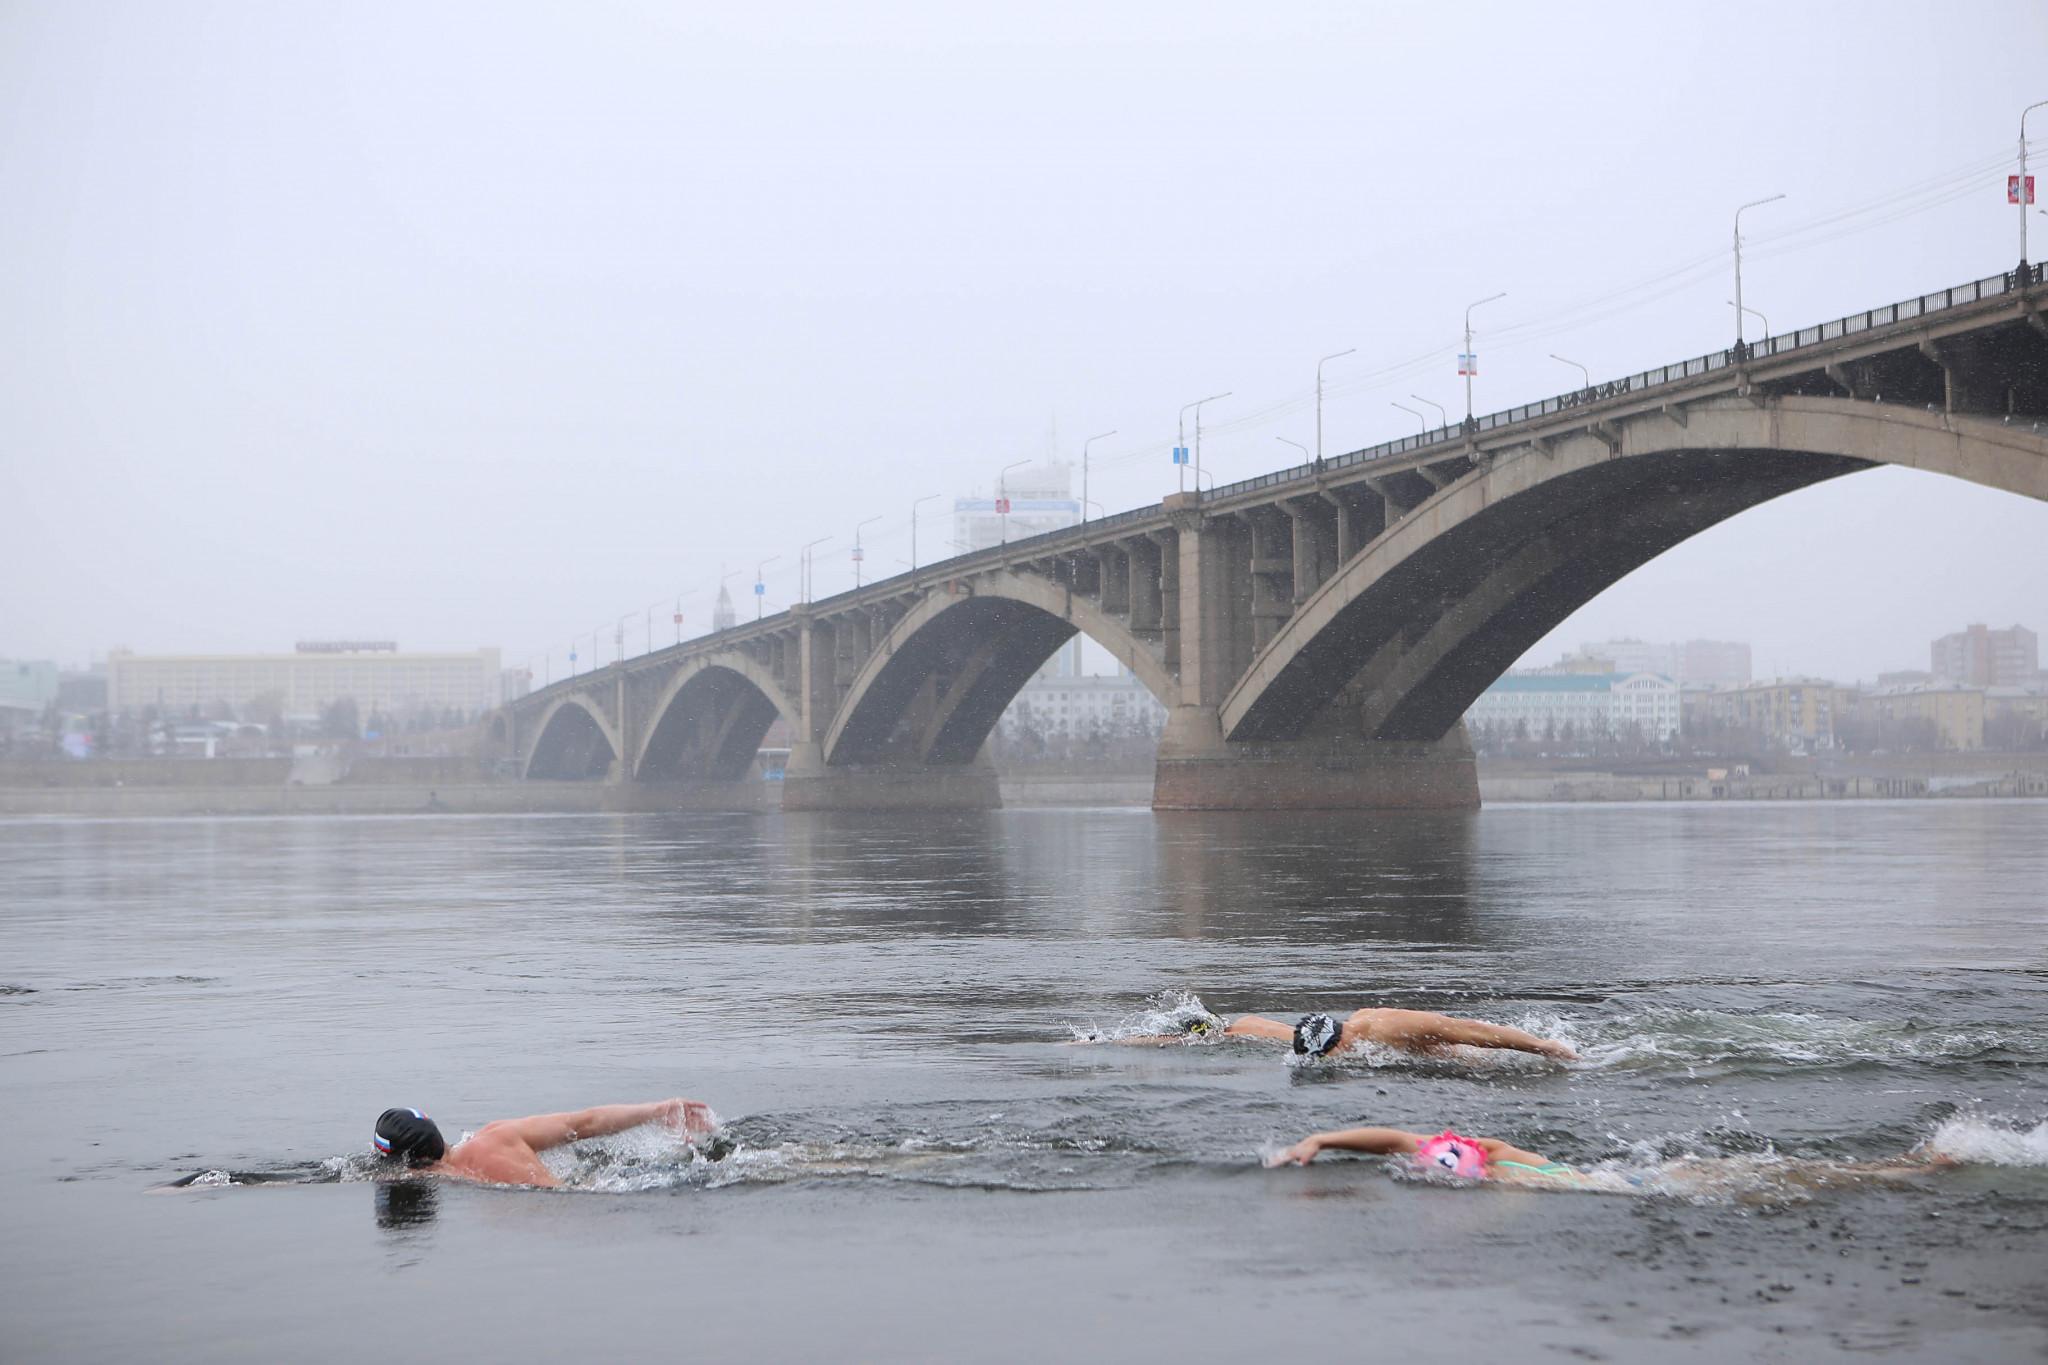 Officials, volunteers and media were invited to join the Krasnoyarsk locals for a swim in the freezing Yenisei River ©Krasnoyarsk 2019